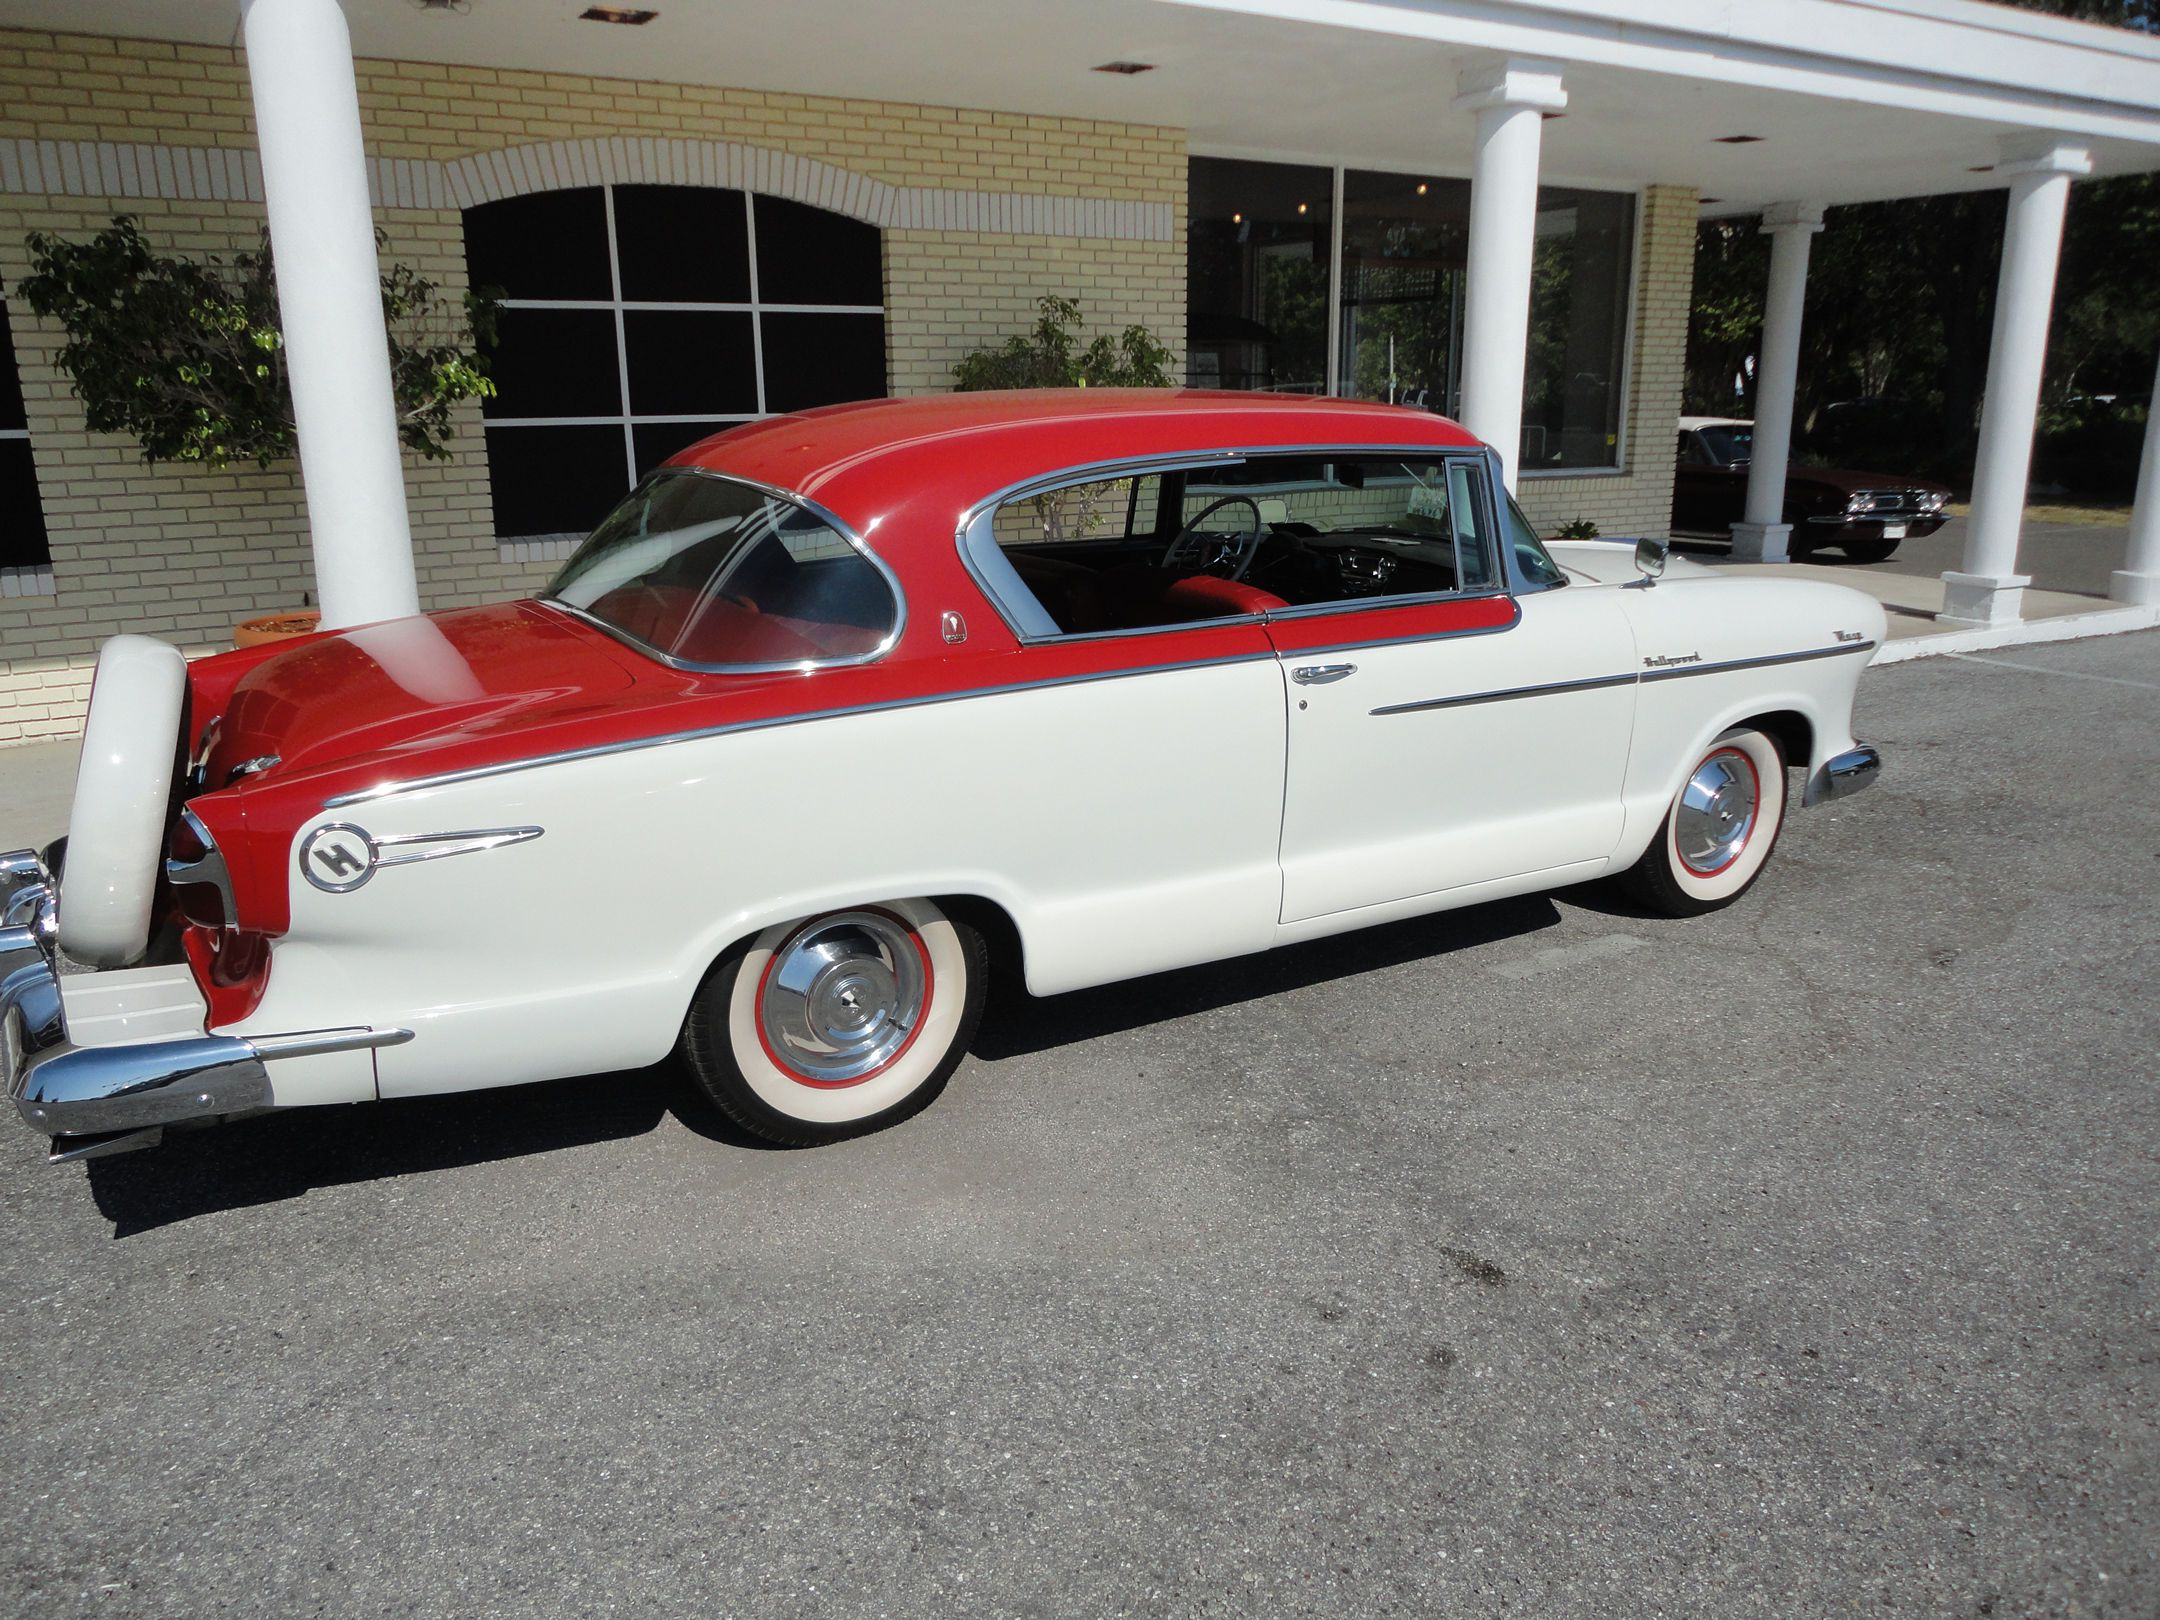 1955 hudson hornet wasp classic cars and pickups. Black Bedroom Furniture Sets. Home Design Ideas